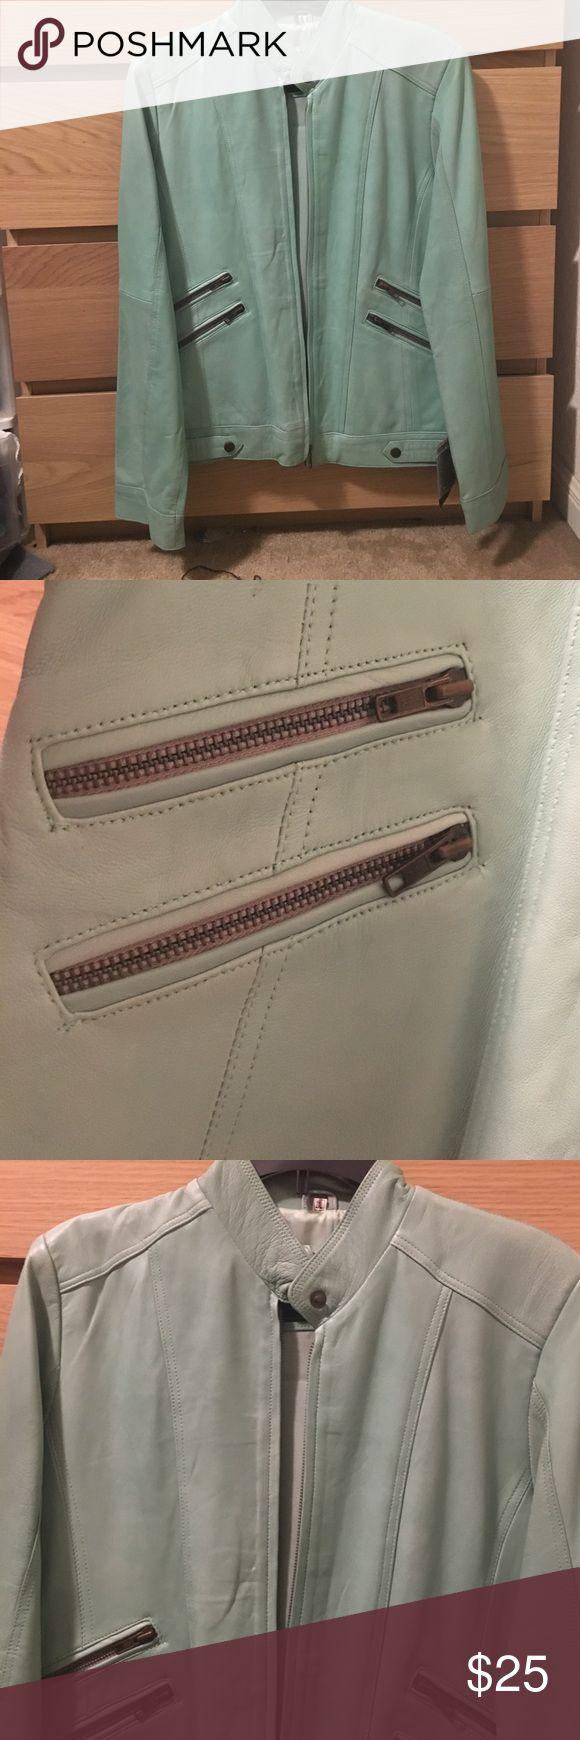 Women's leather jacket Sea green leather jacket ( never worn ) Jackets & Coats